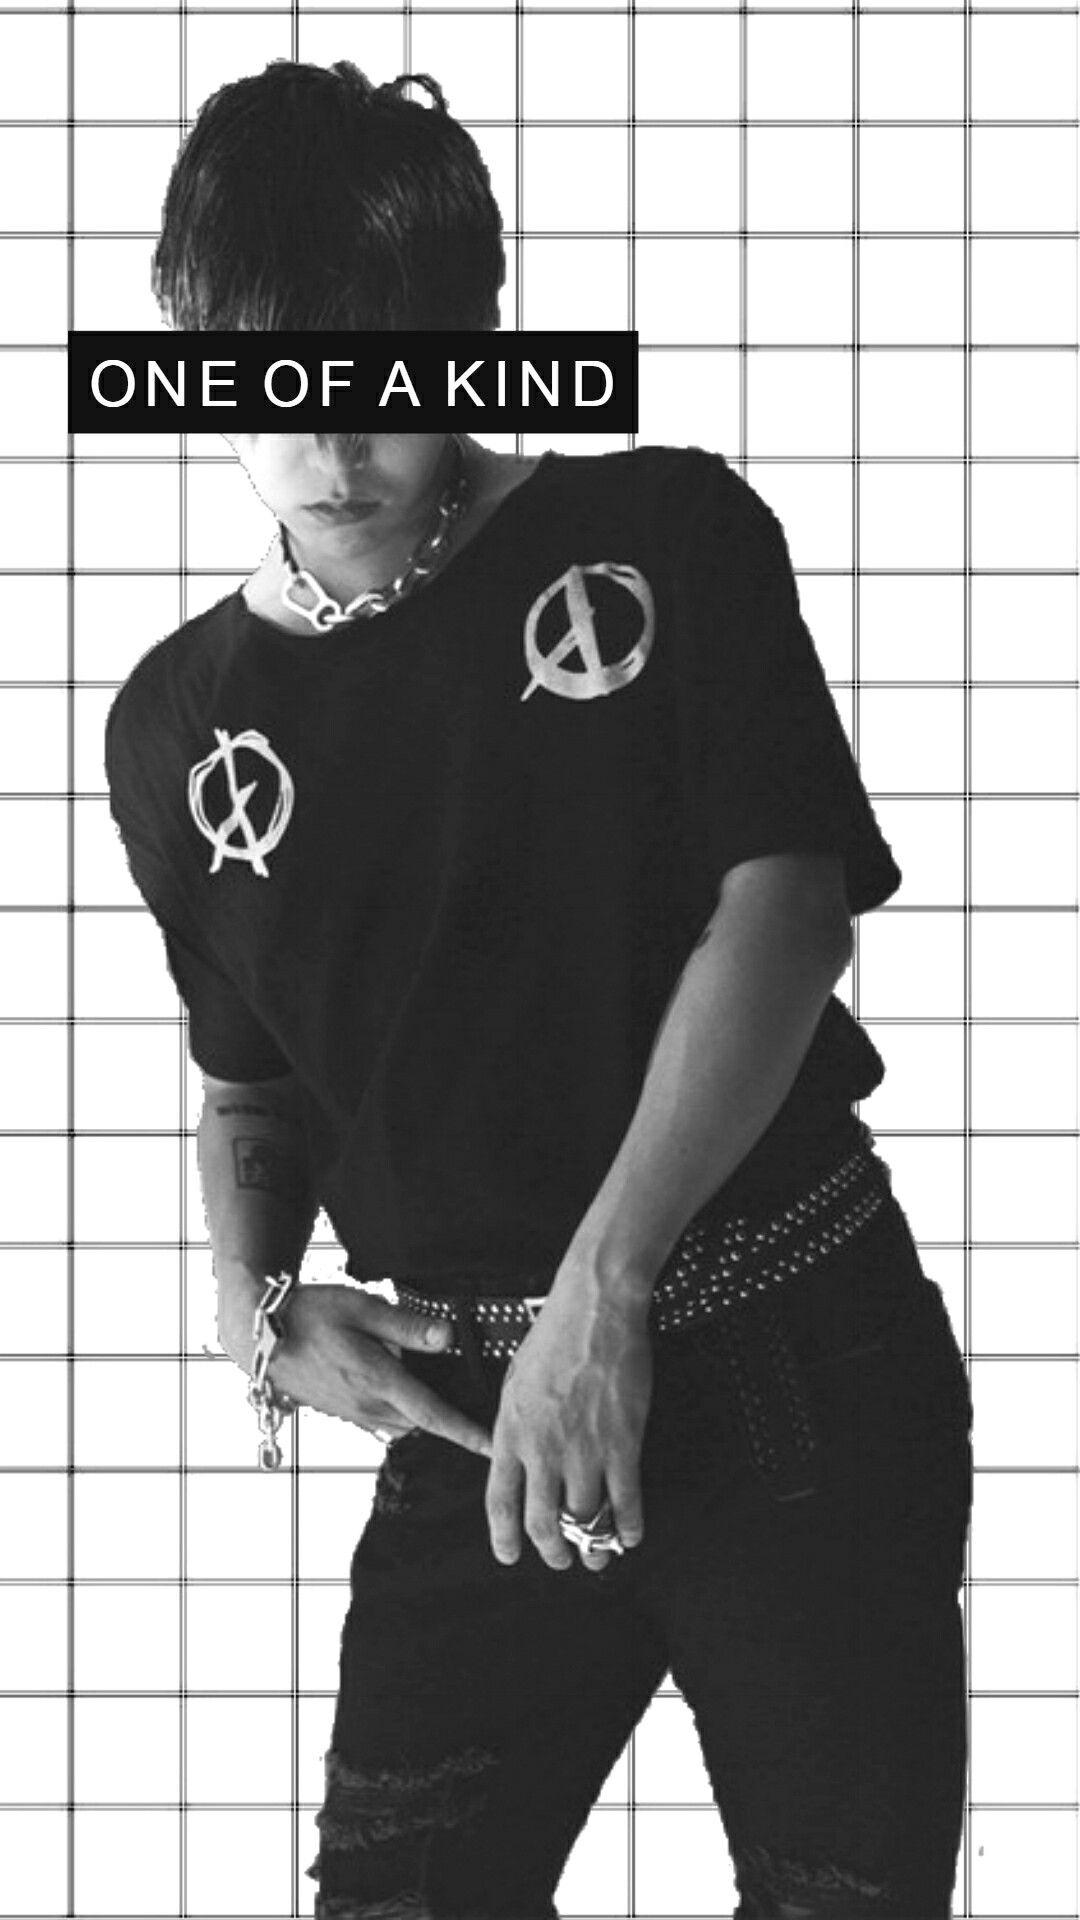 GDRAGON BIGBANG WALLPAPER / LOCKSCREEN